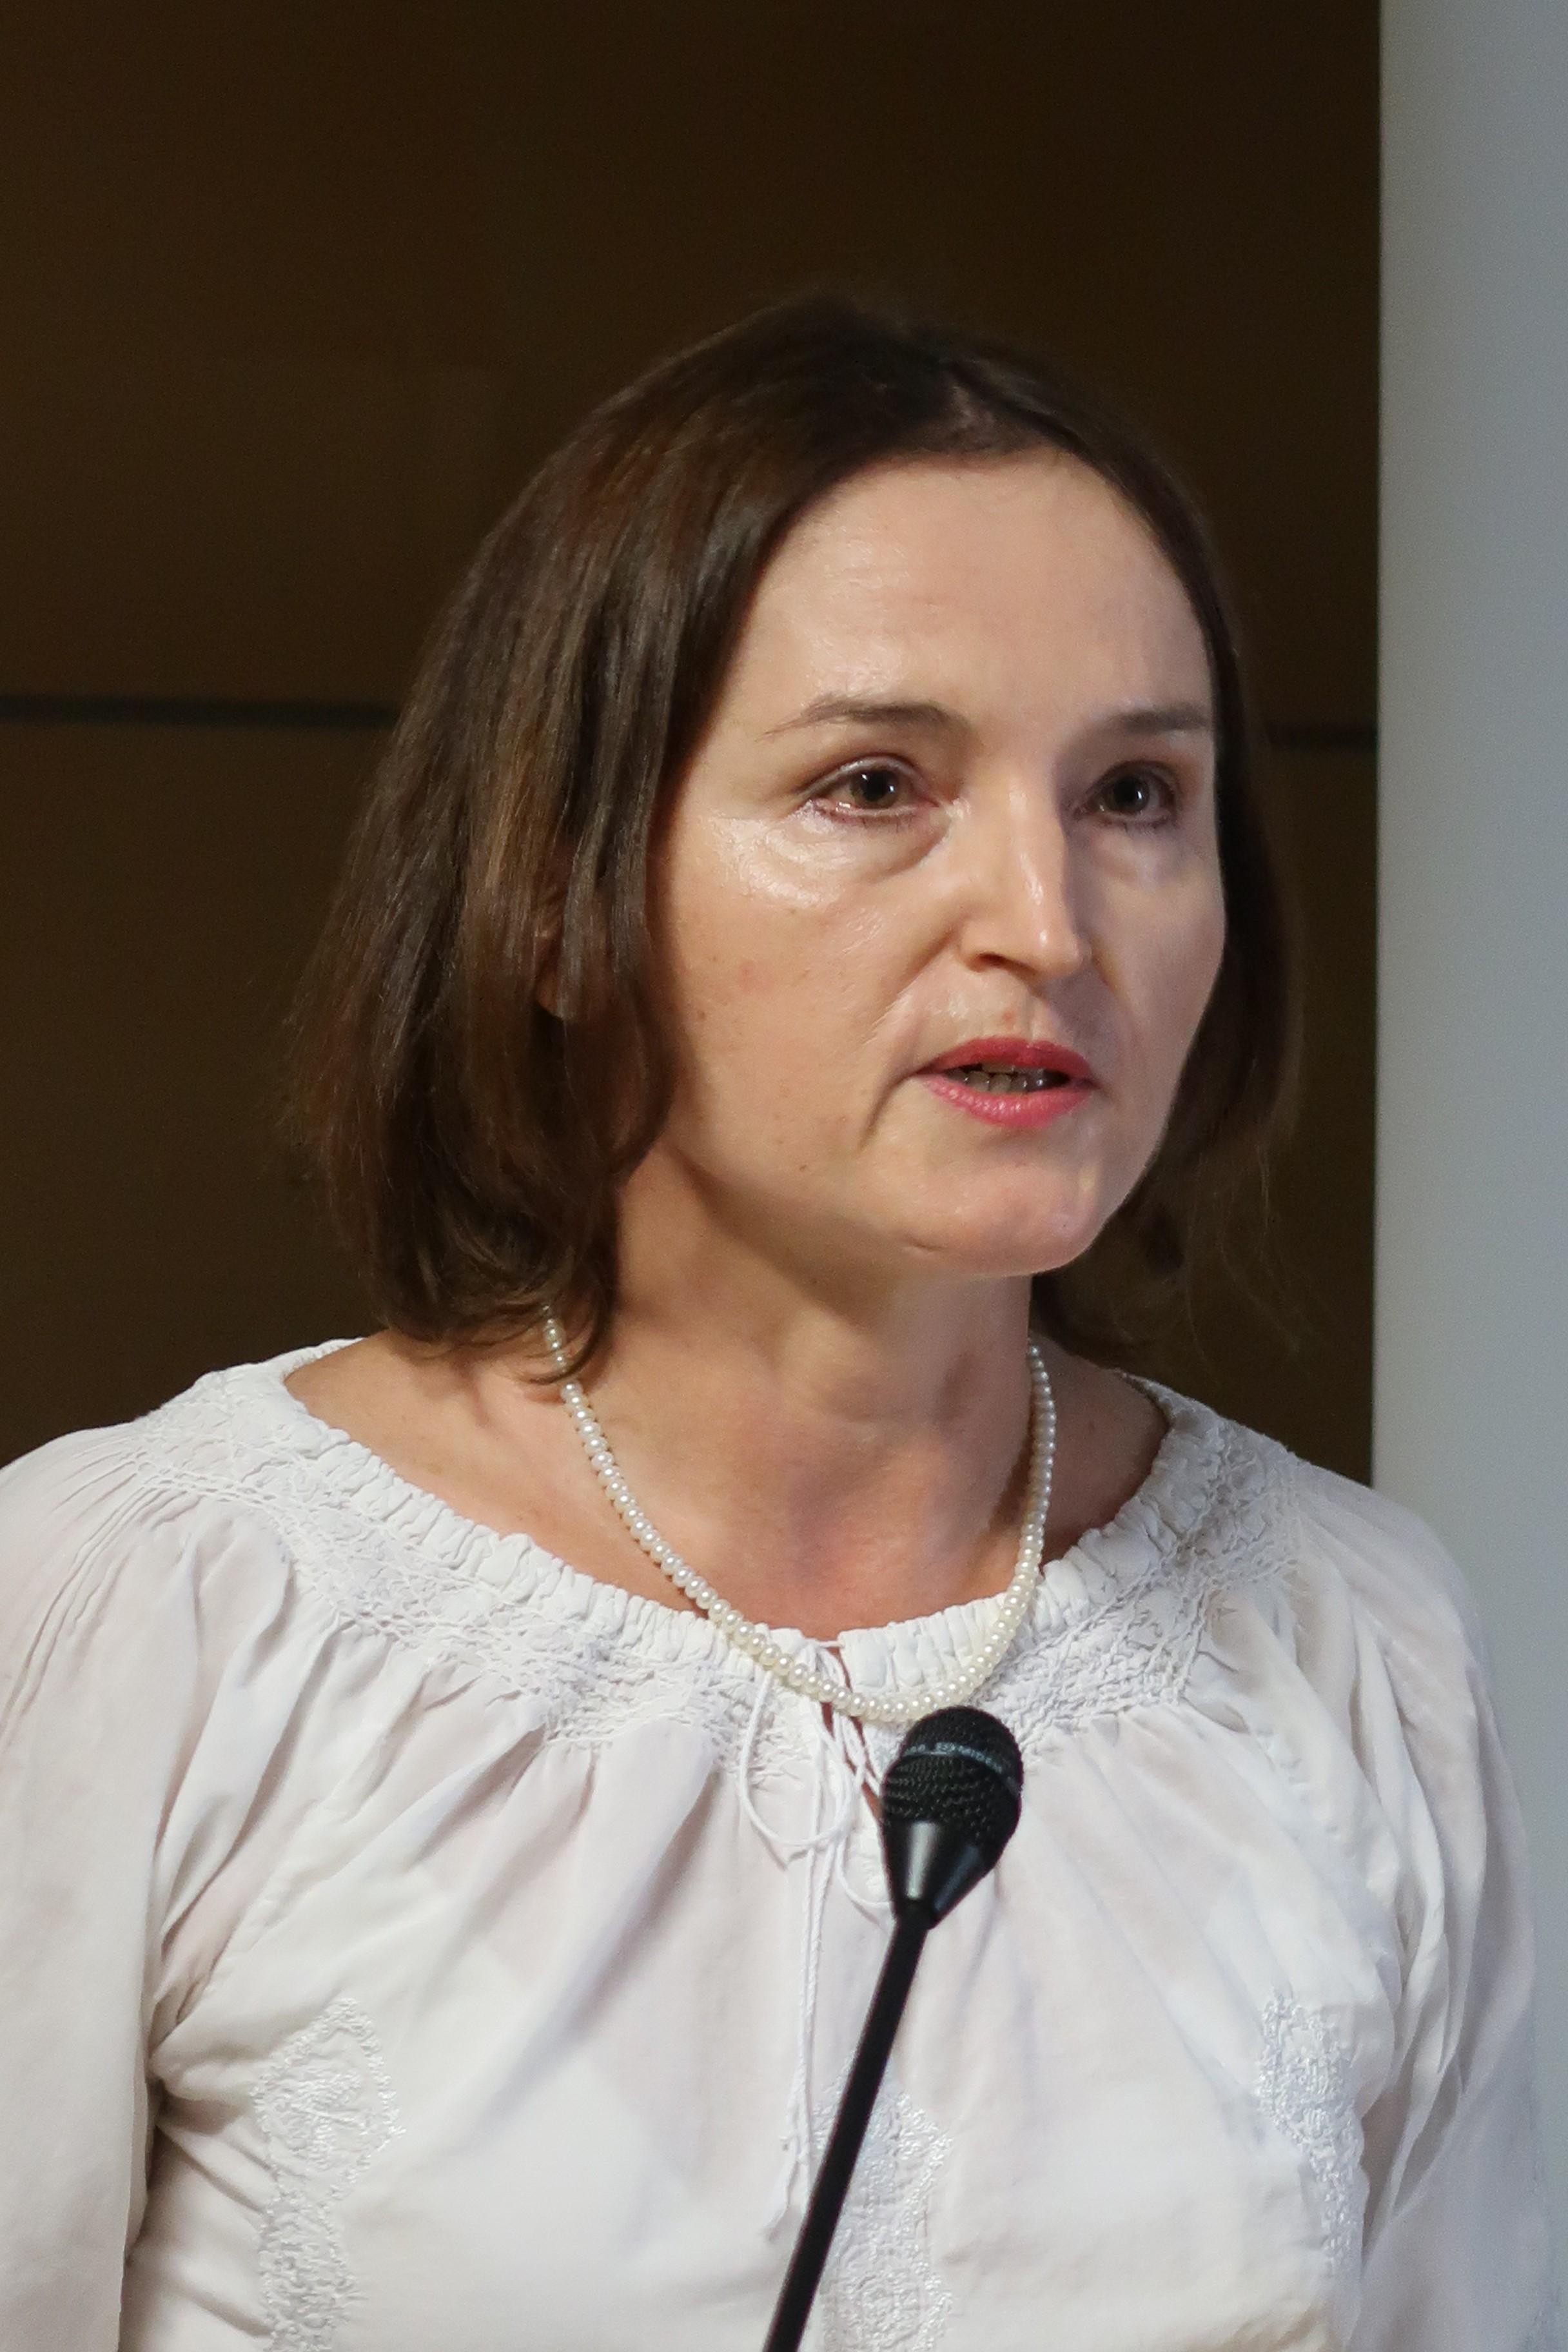 Prof. dr. Hana Ross, School of Economics, University of Cape Town